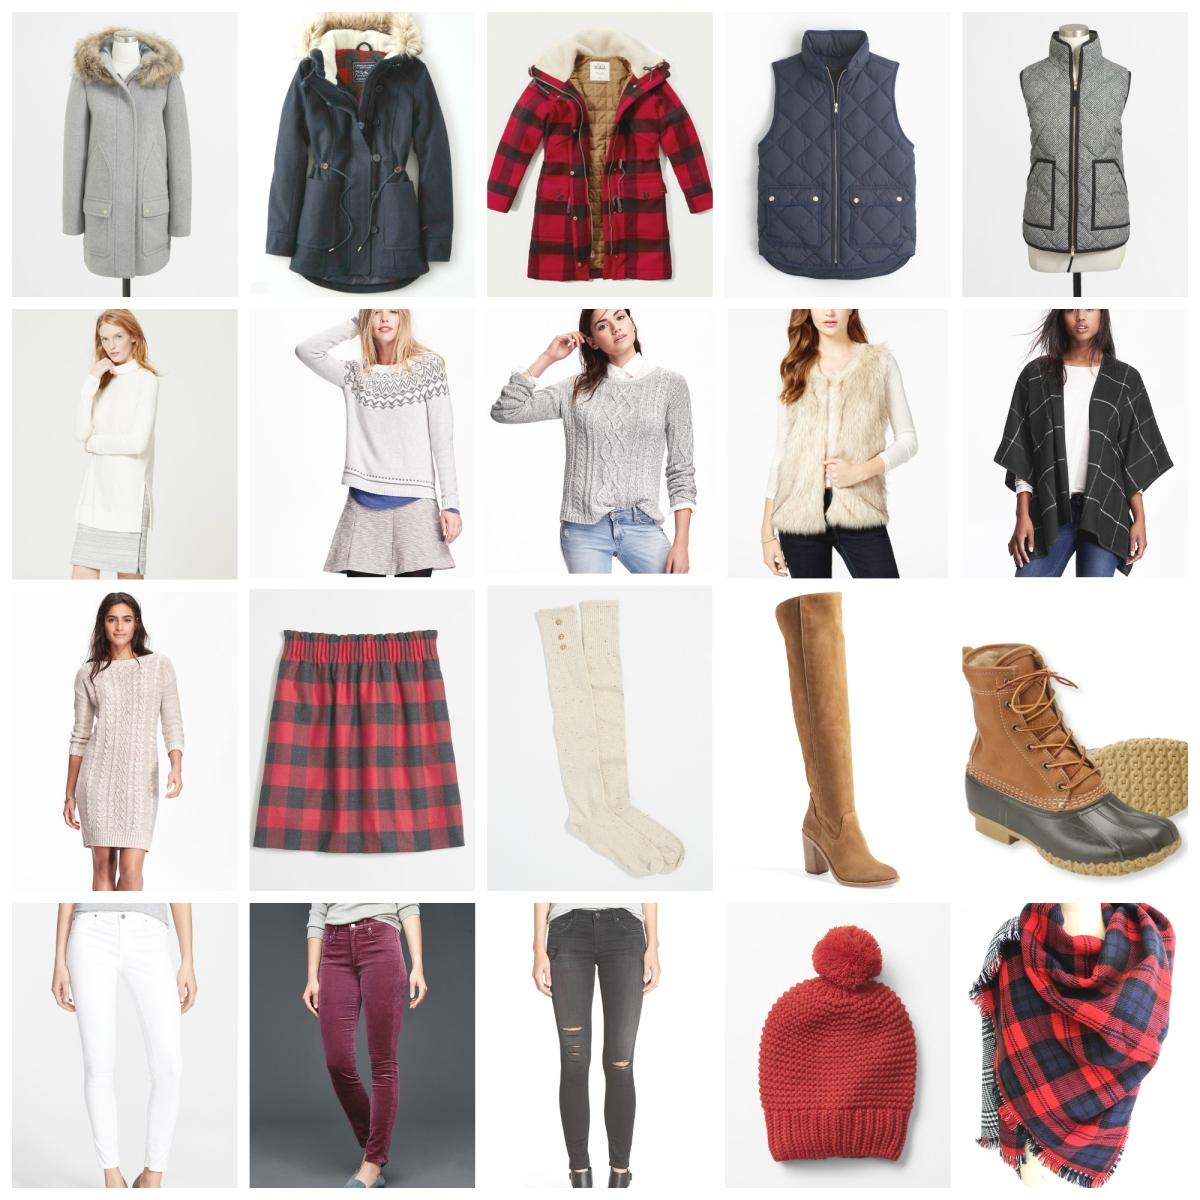 Winter 2015 Wardrobe Essentials  www.pearlsandsportsbras.com 